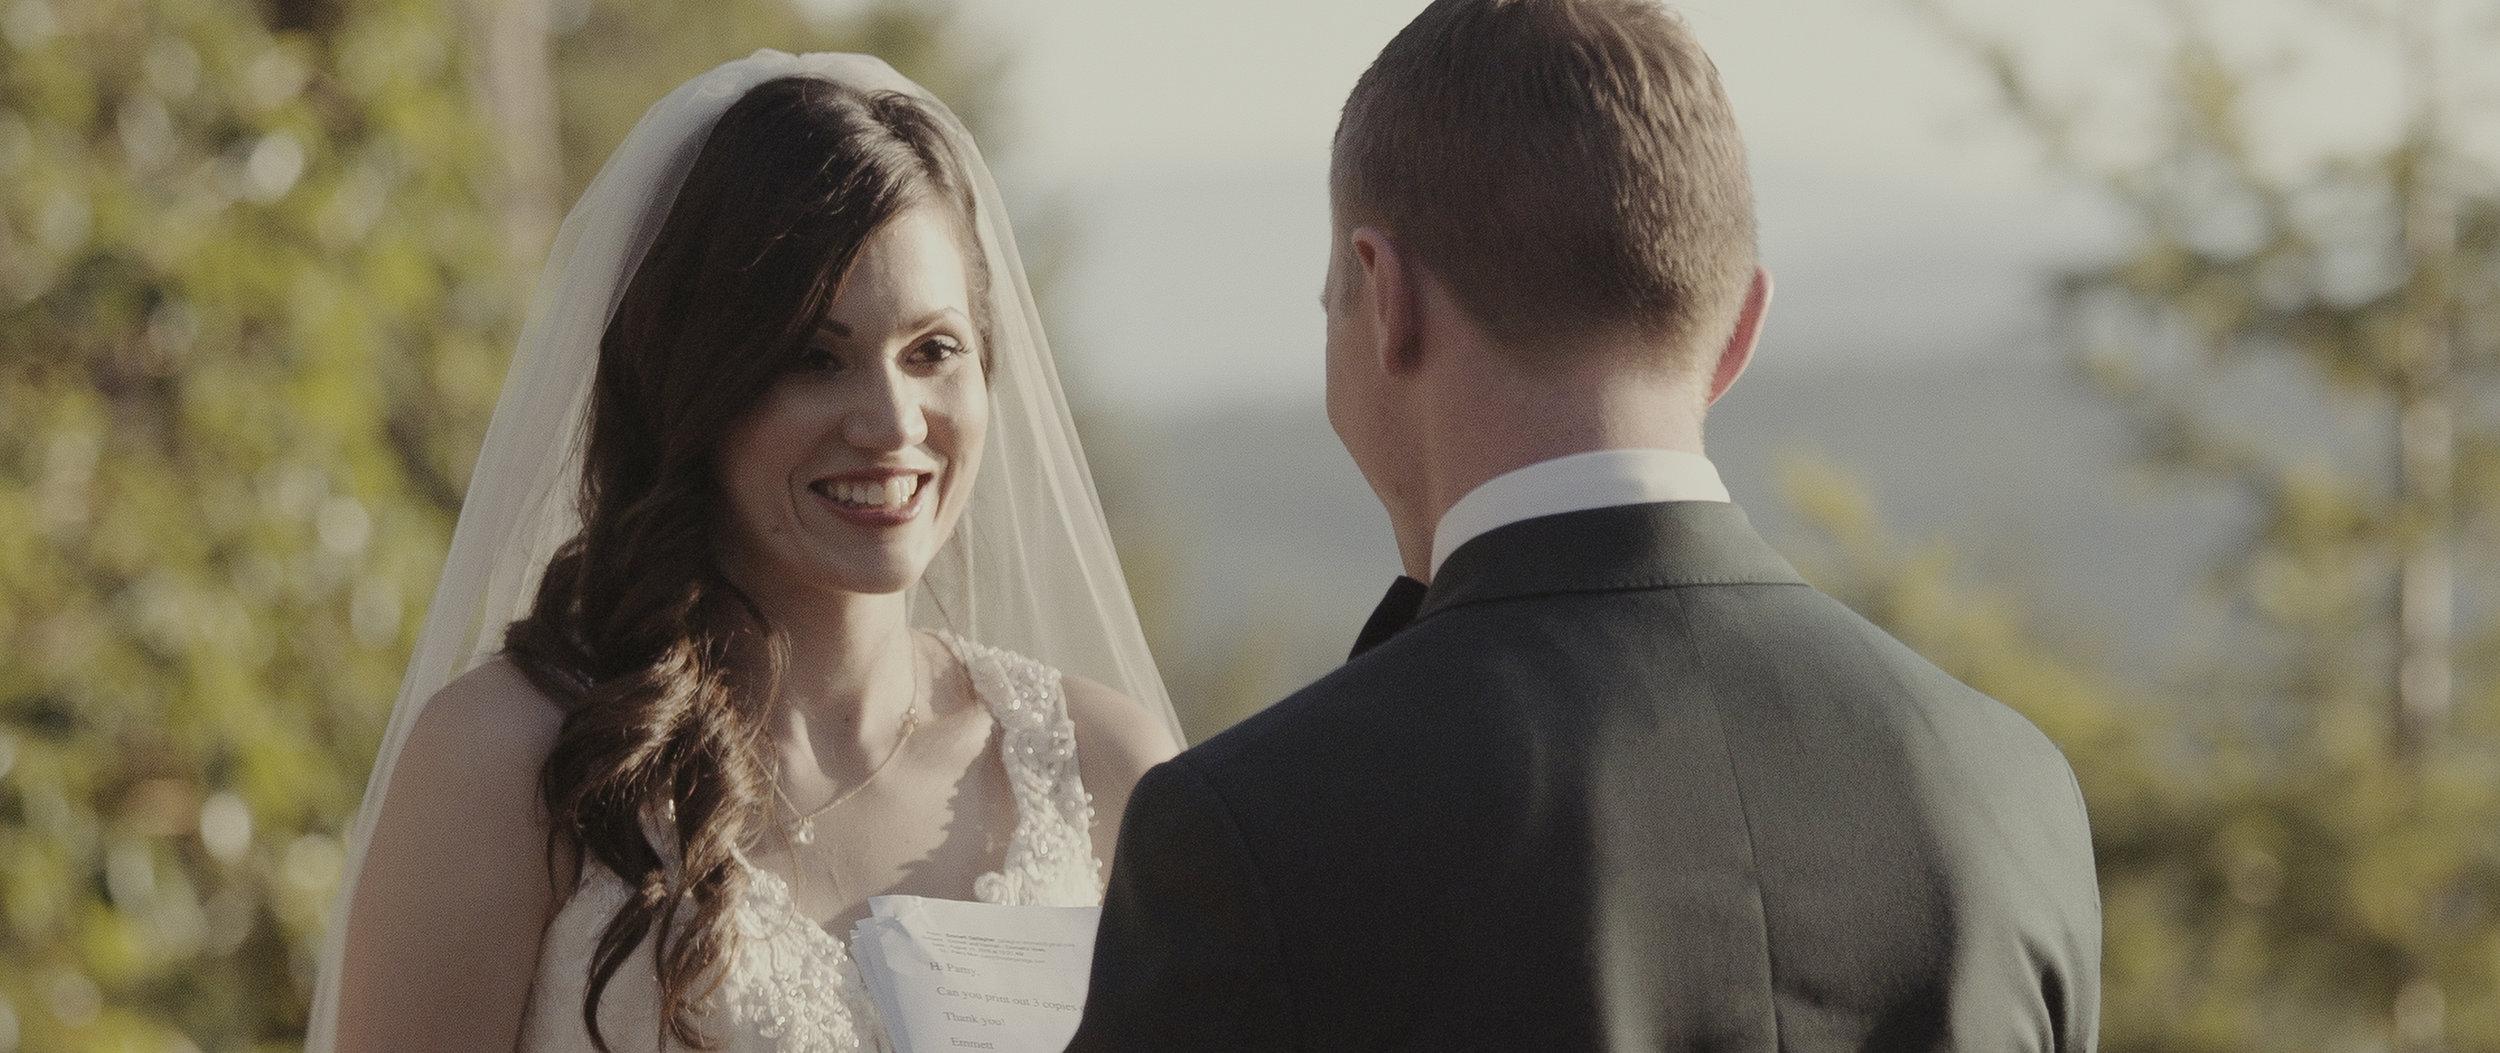 Galiano Island Wedding Videography_-4.jpg